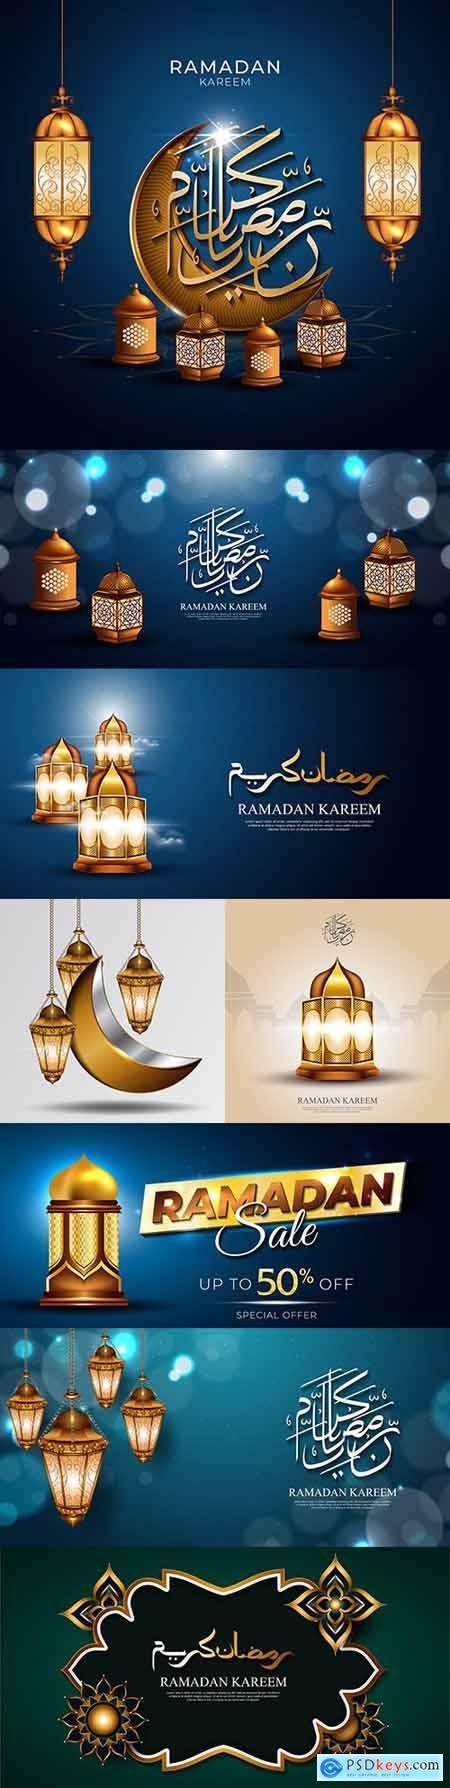 Ramadan Kareem with shining hanging gold lights 3